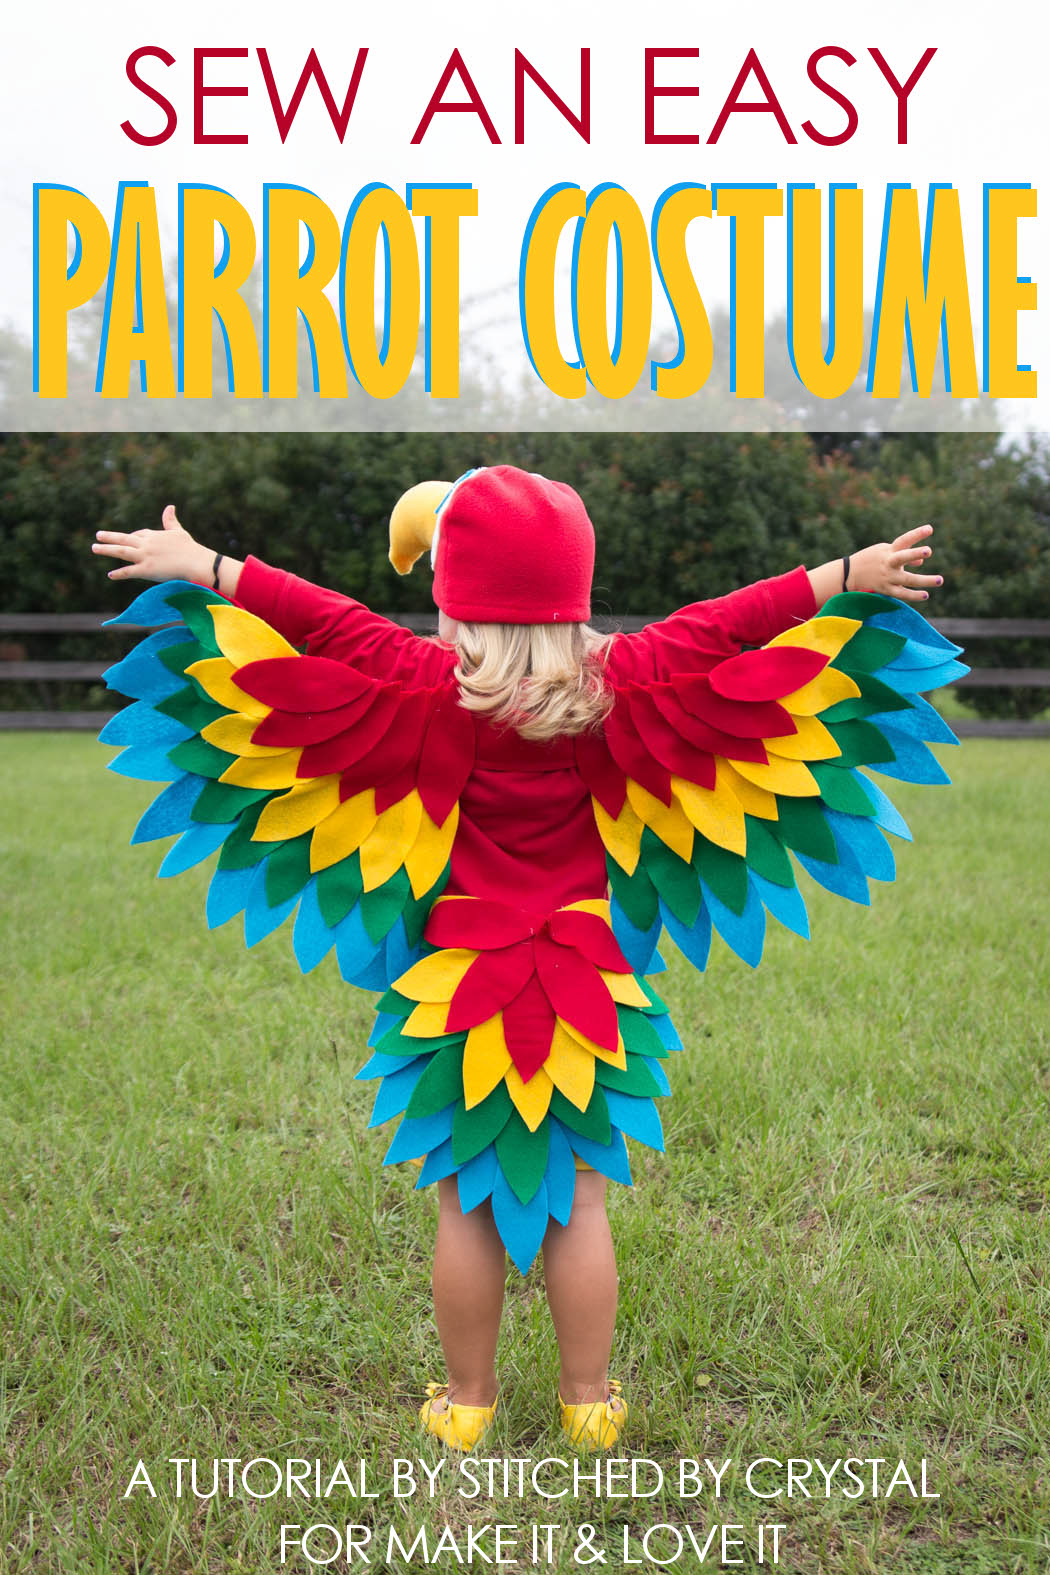 18 DIY Animal Halloween Costumes for Kids | HolidaySmart